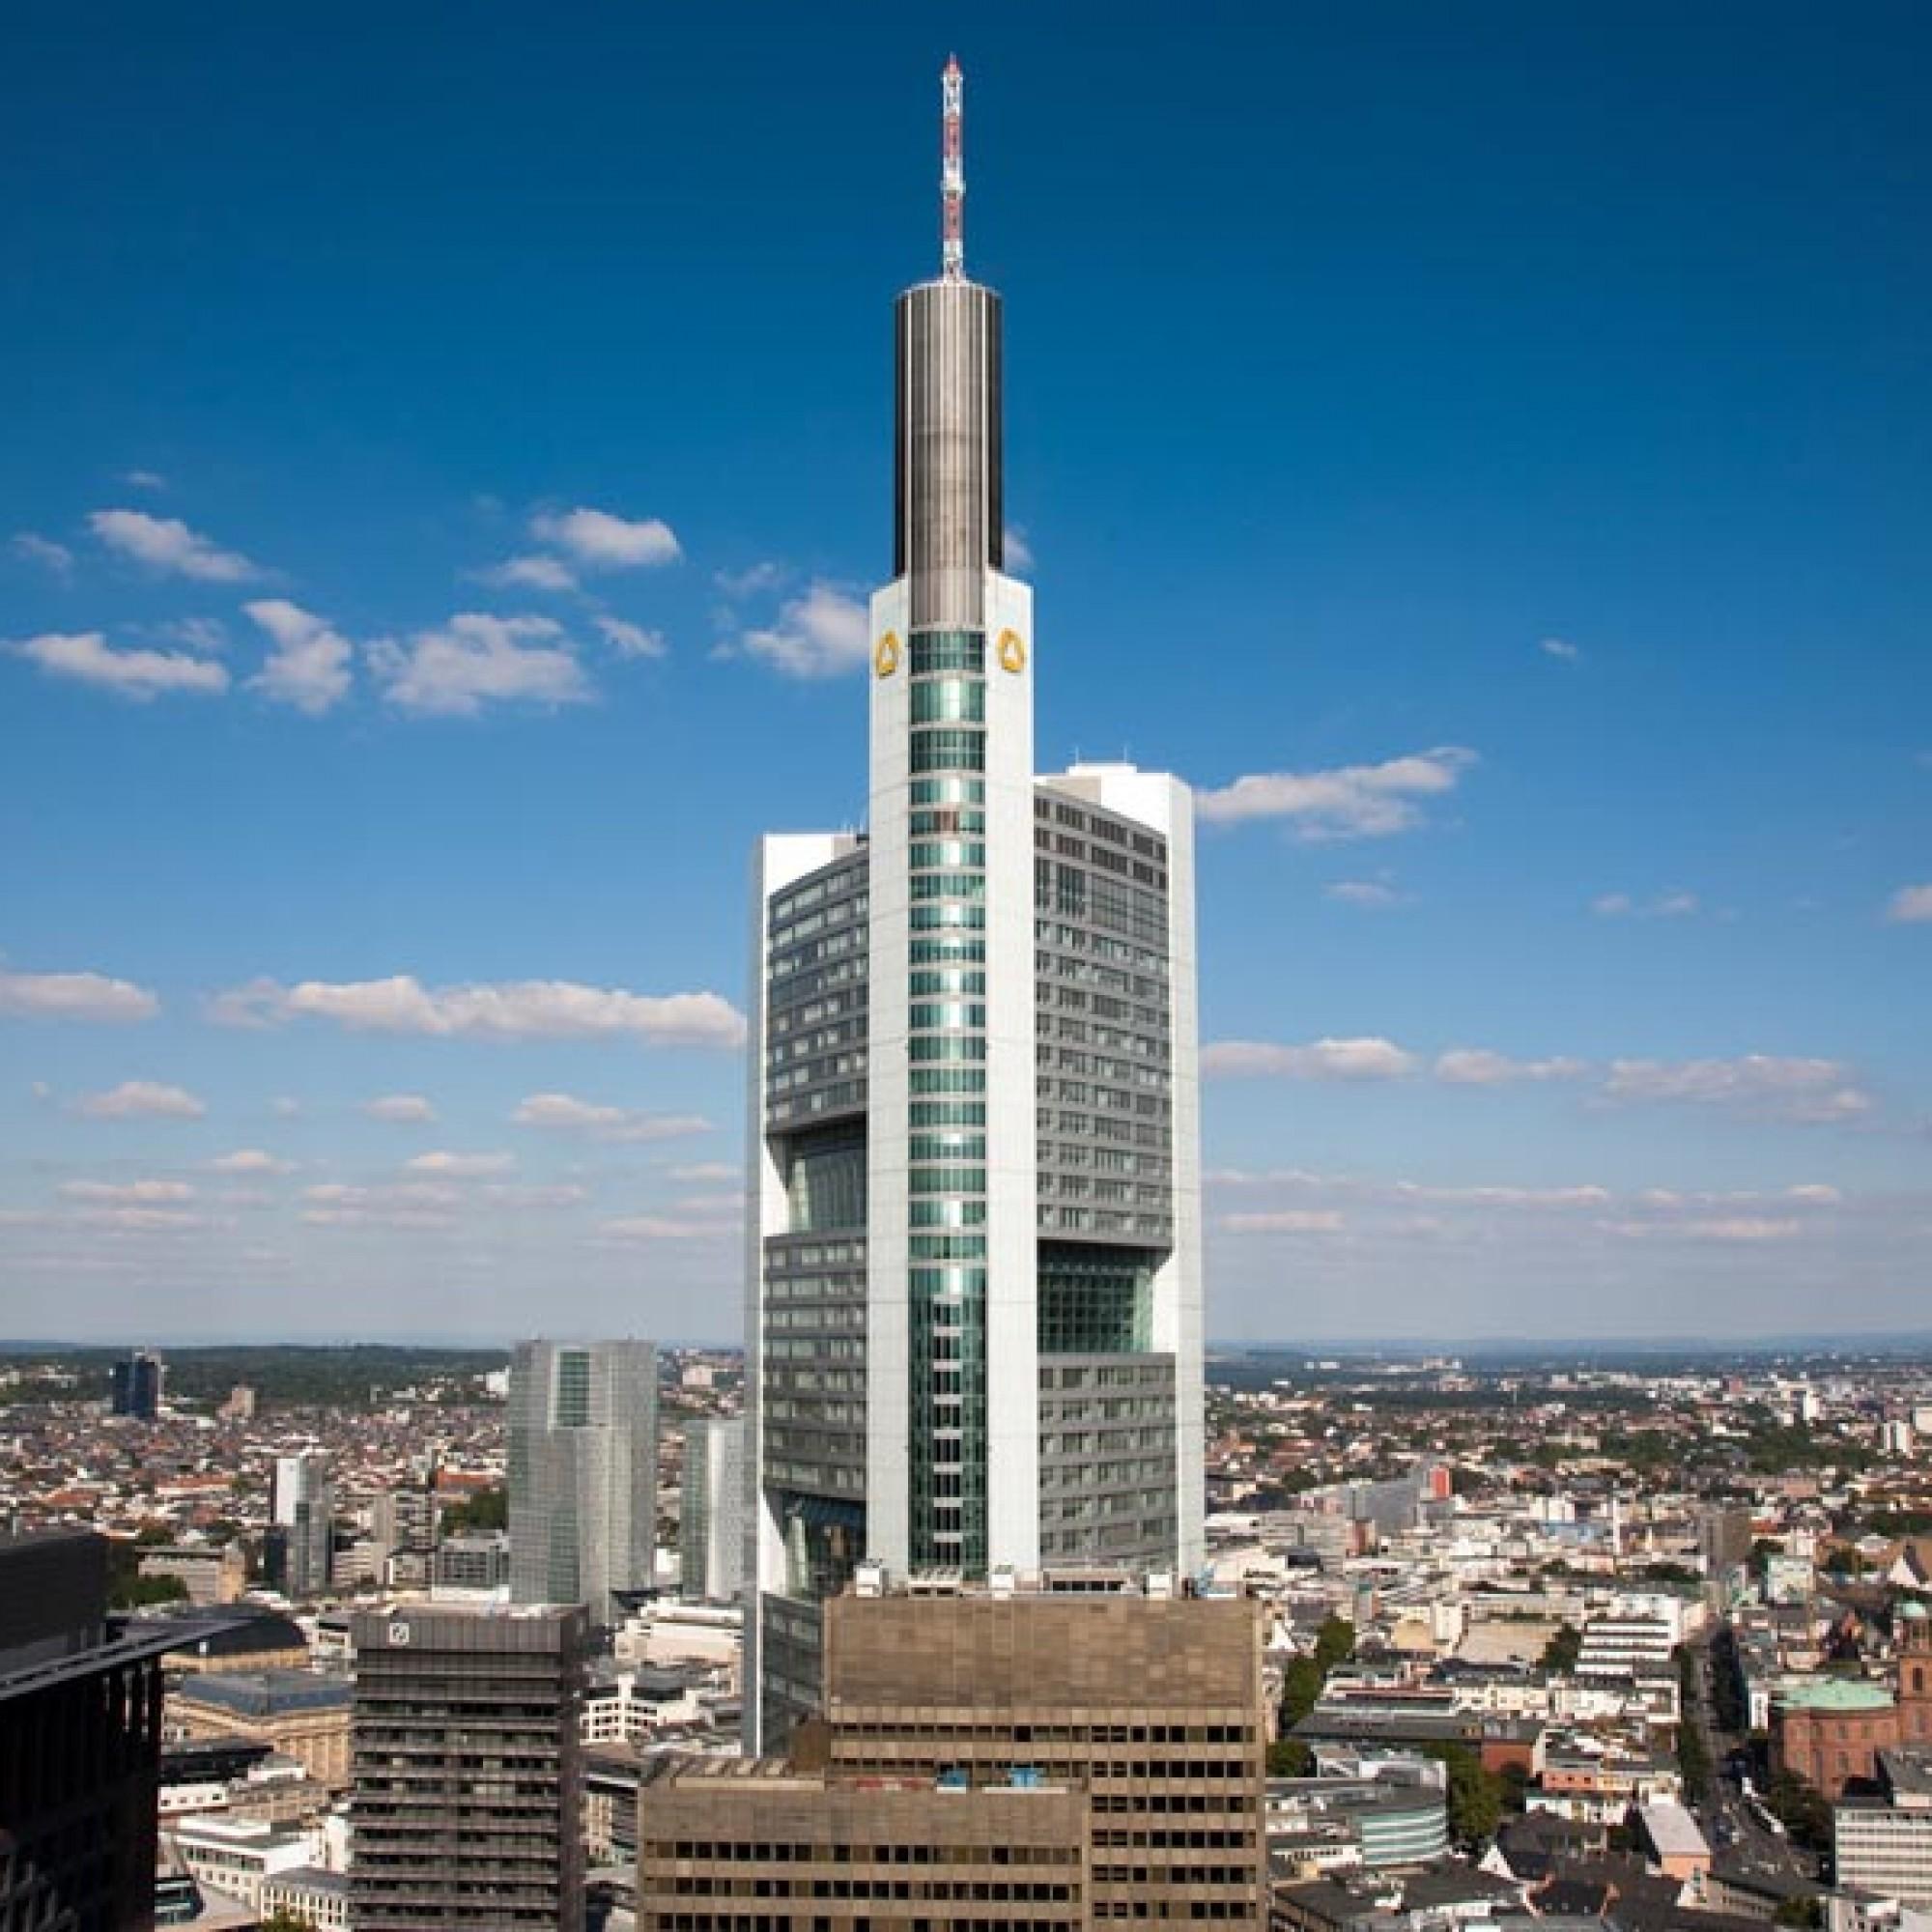 Ansicht des Commerzbank-Towers mit den an den Fassadenfronten versetzten Skygärten. (Fotos: Commerzbank AG)